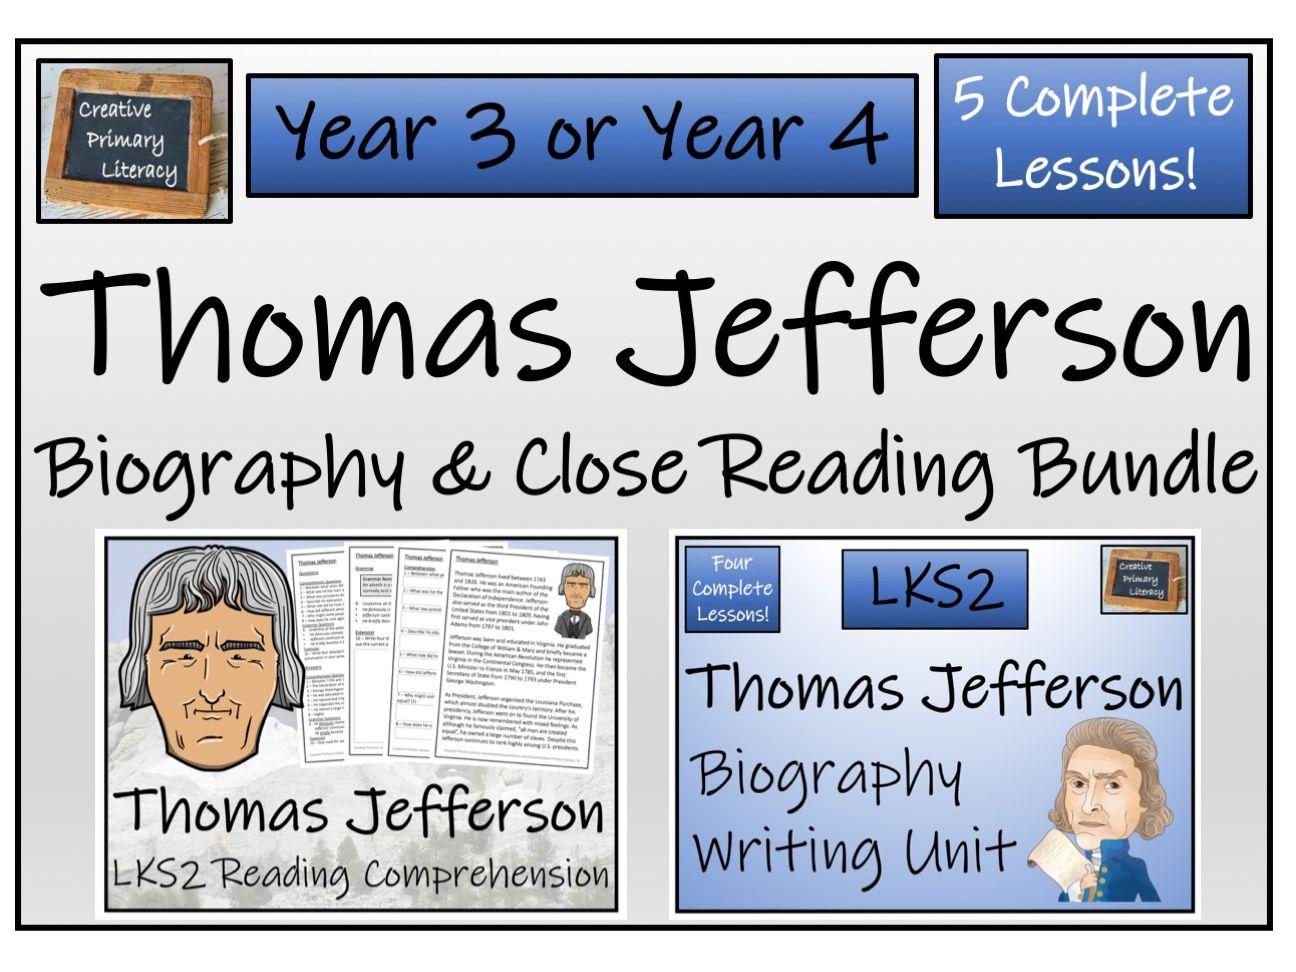 LKS2 - Thomas Jefferson Reading Comprehension & Biography Bundle